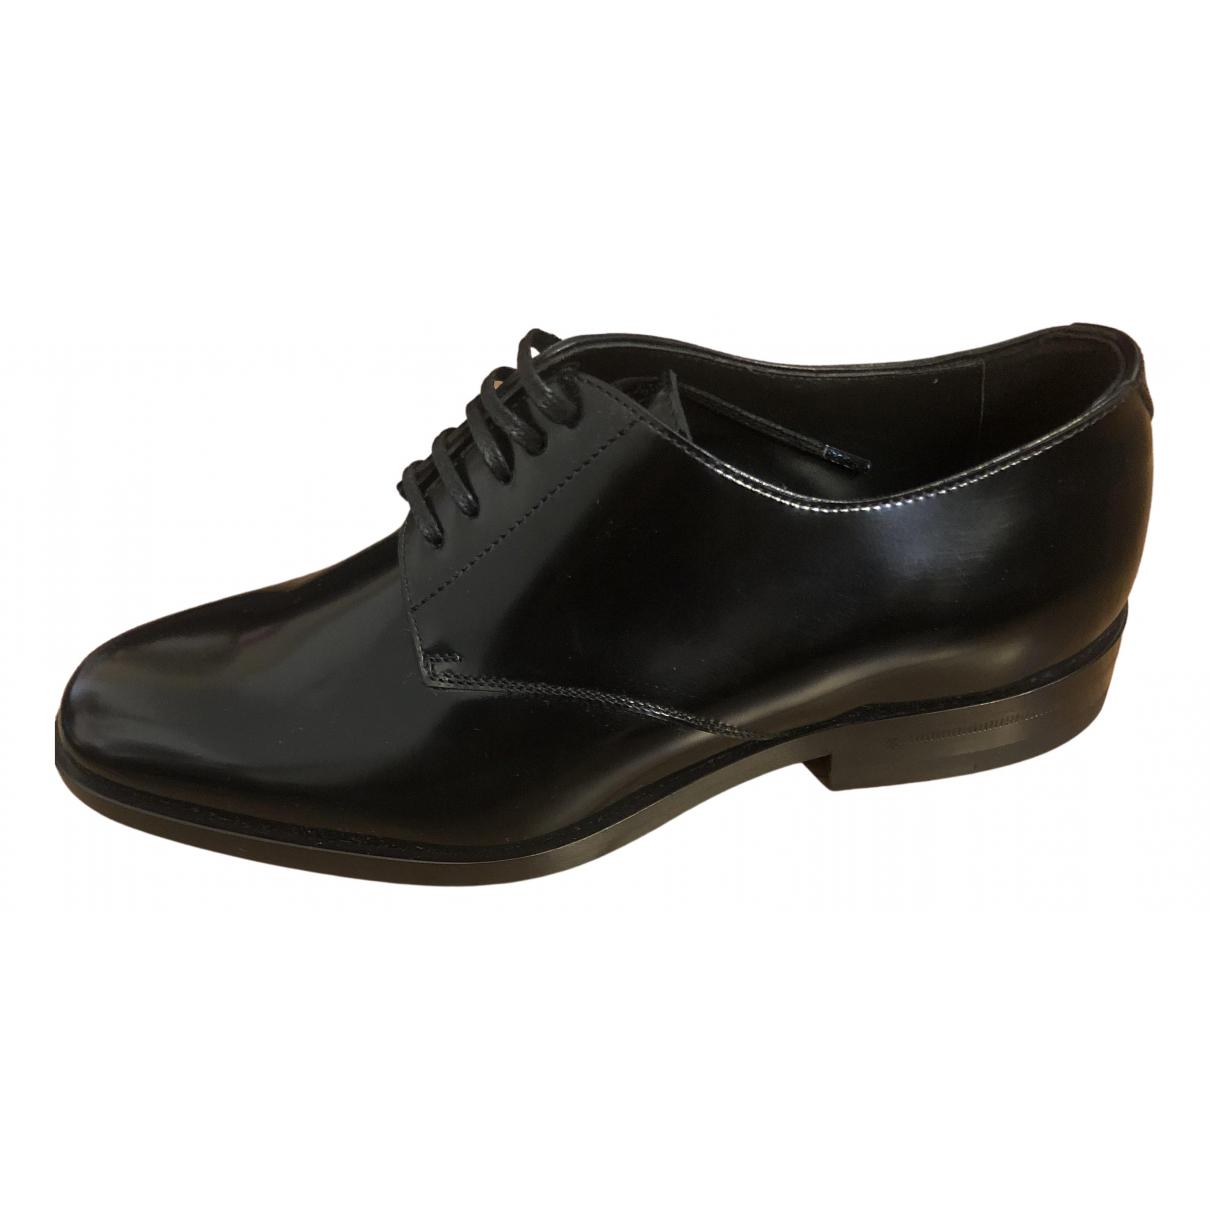 Saint Laurent N Black Leather Flats for Women 36 EU